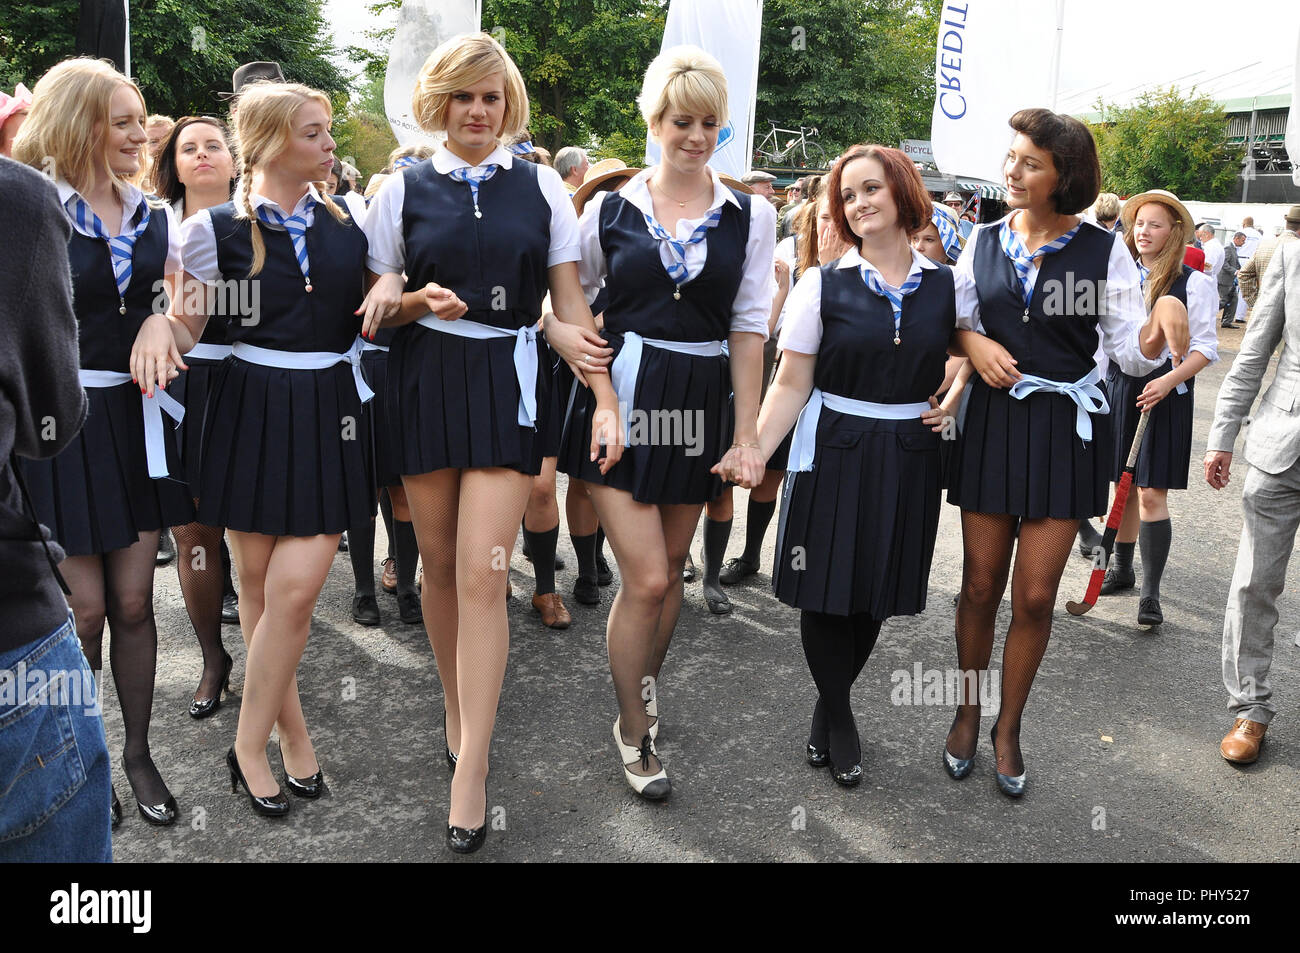 Simply magnificent St trinian s school uniform